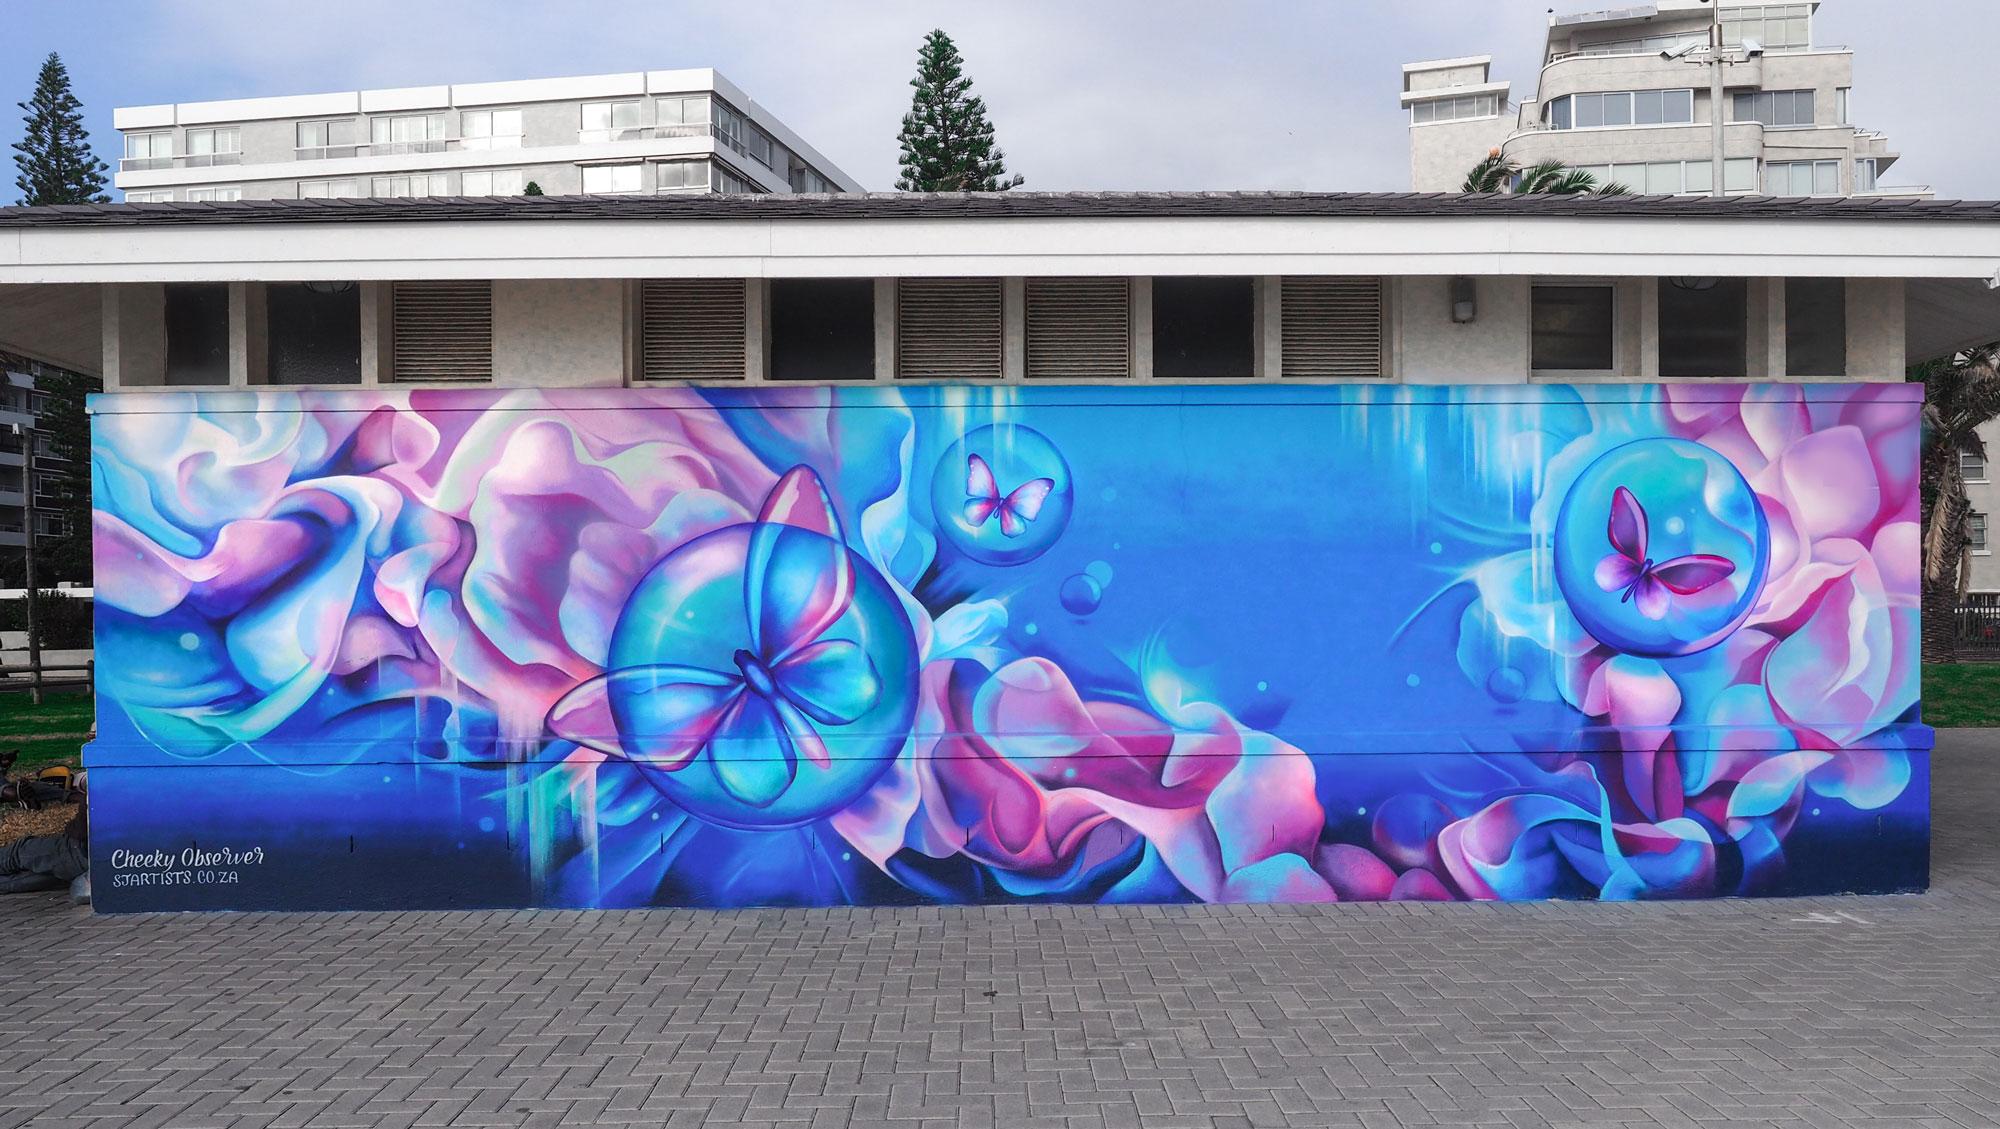 Cheeky Observer Street Art